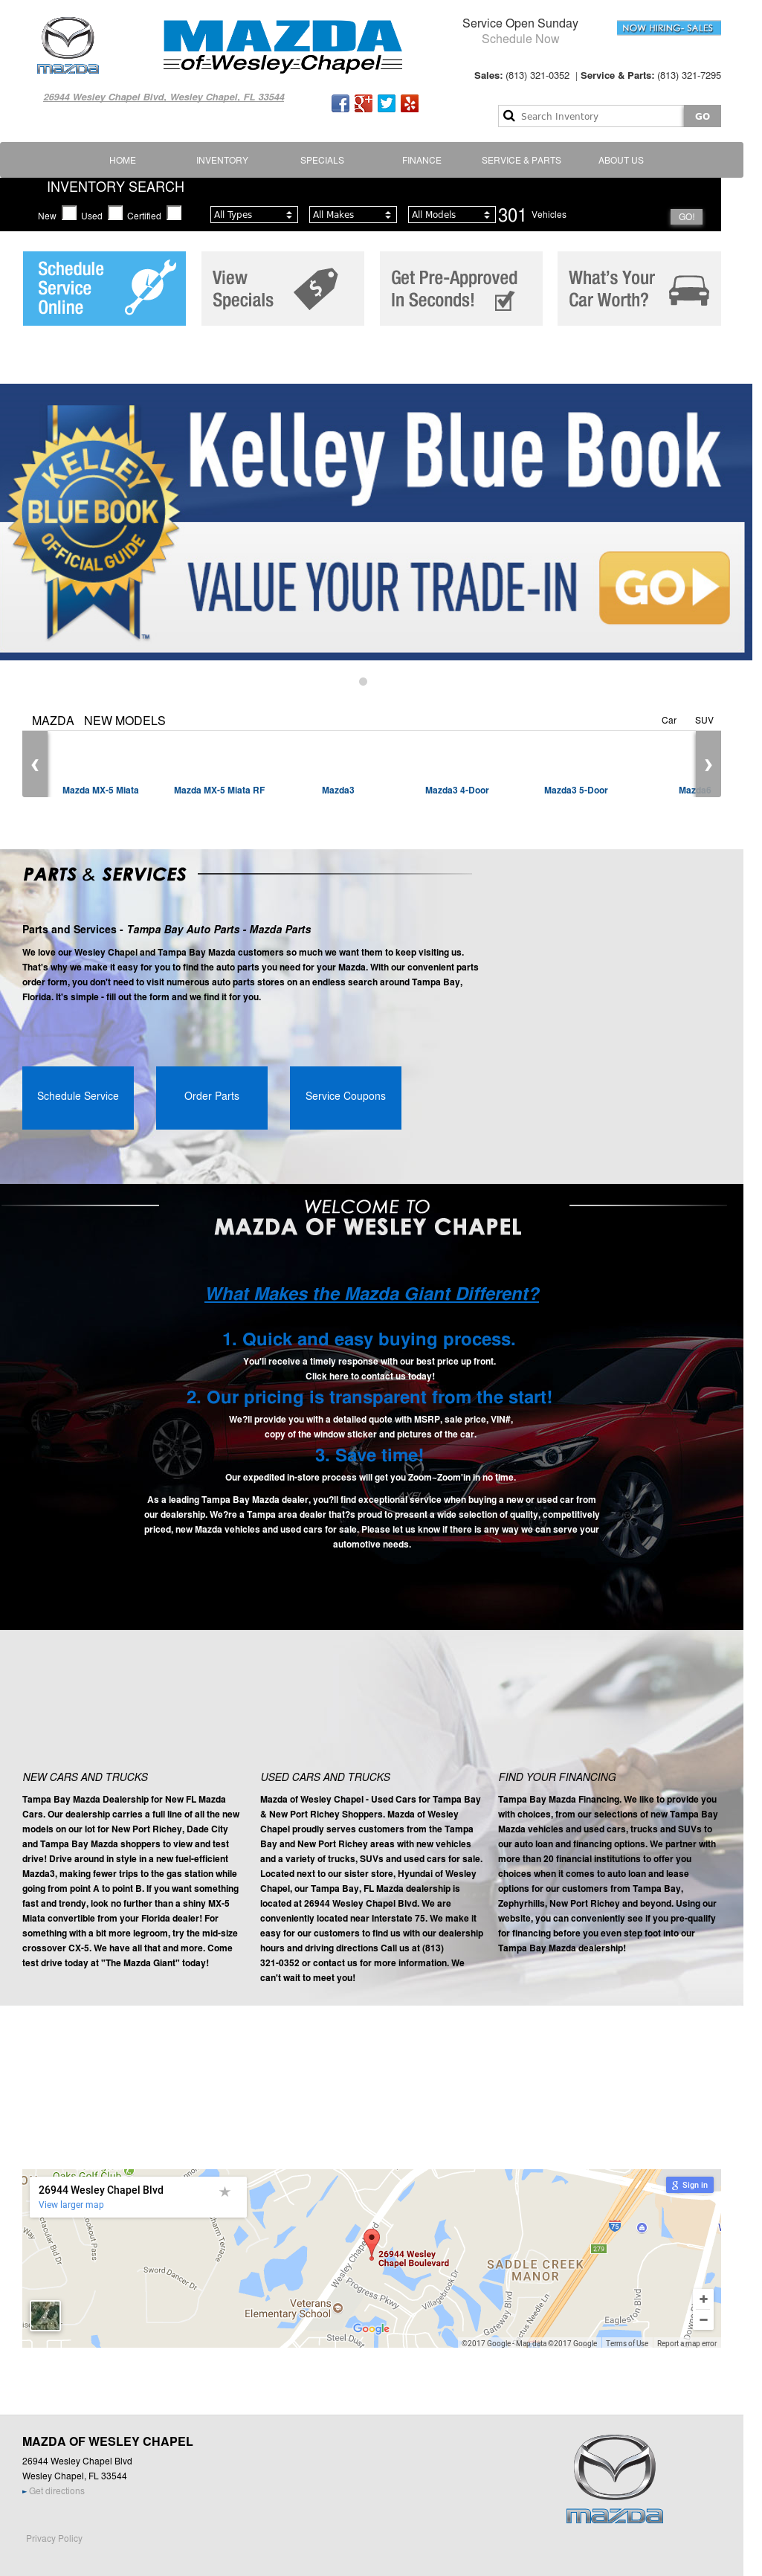 Mazda Of Wesley Chapel Website History